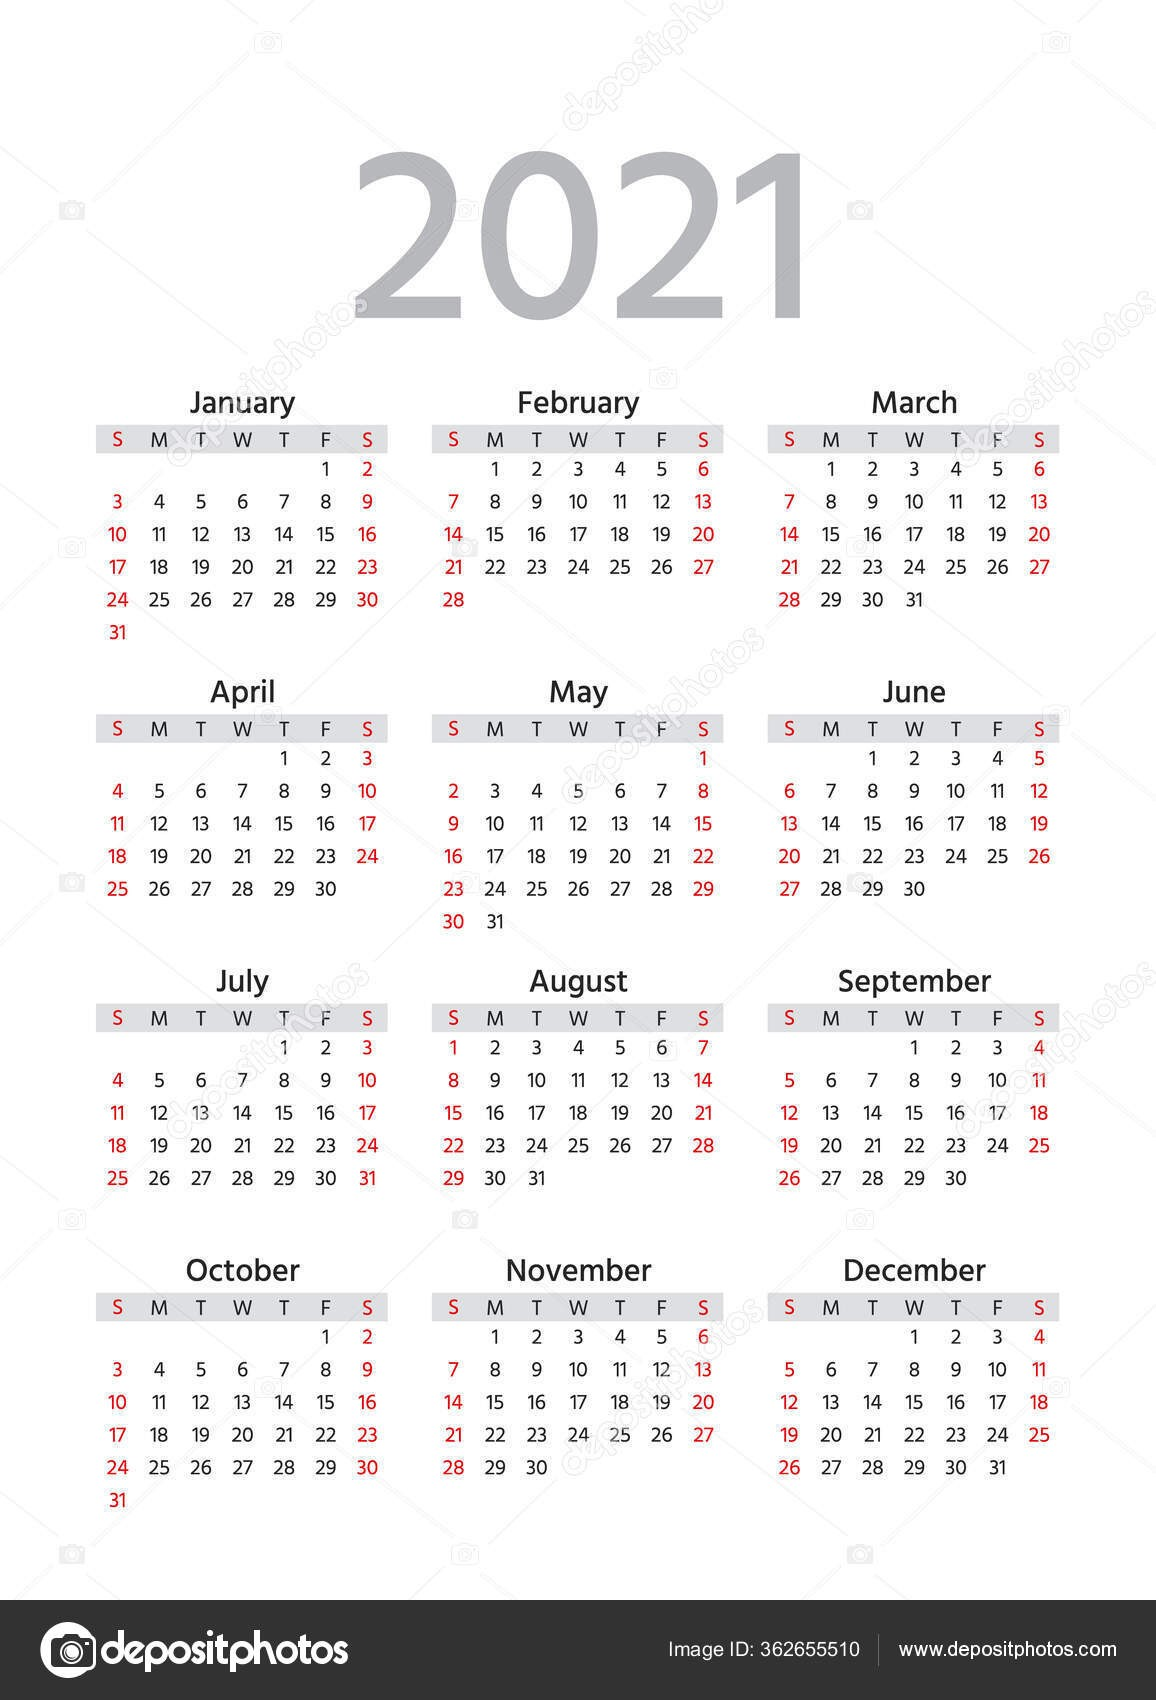 depositphotos stock illustration 2021 calendar week starts sunday